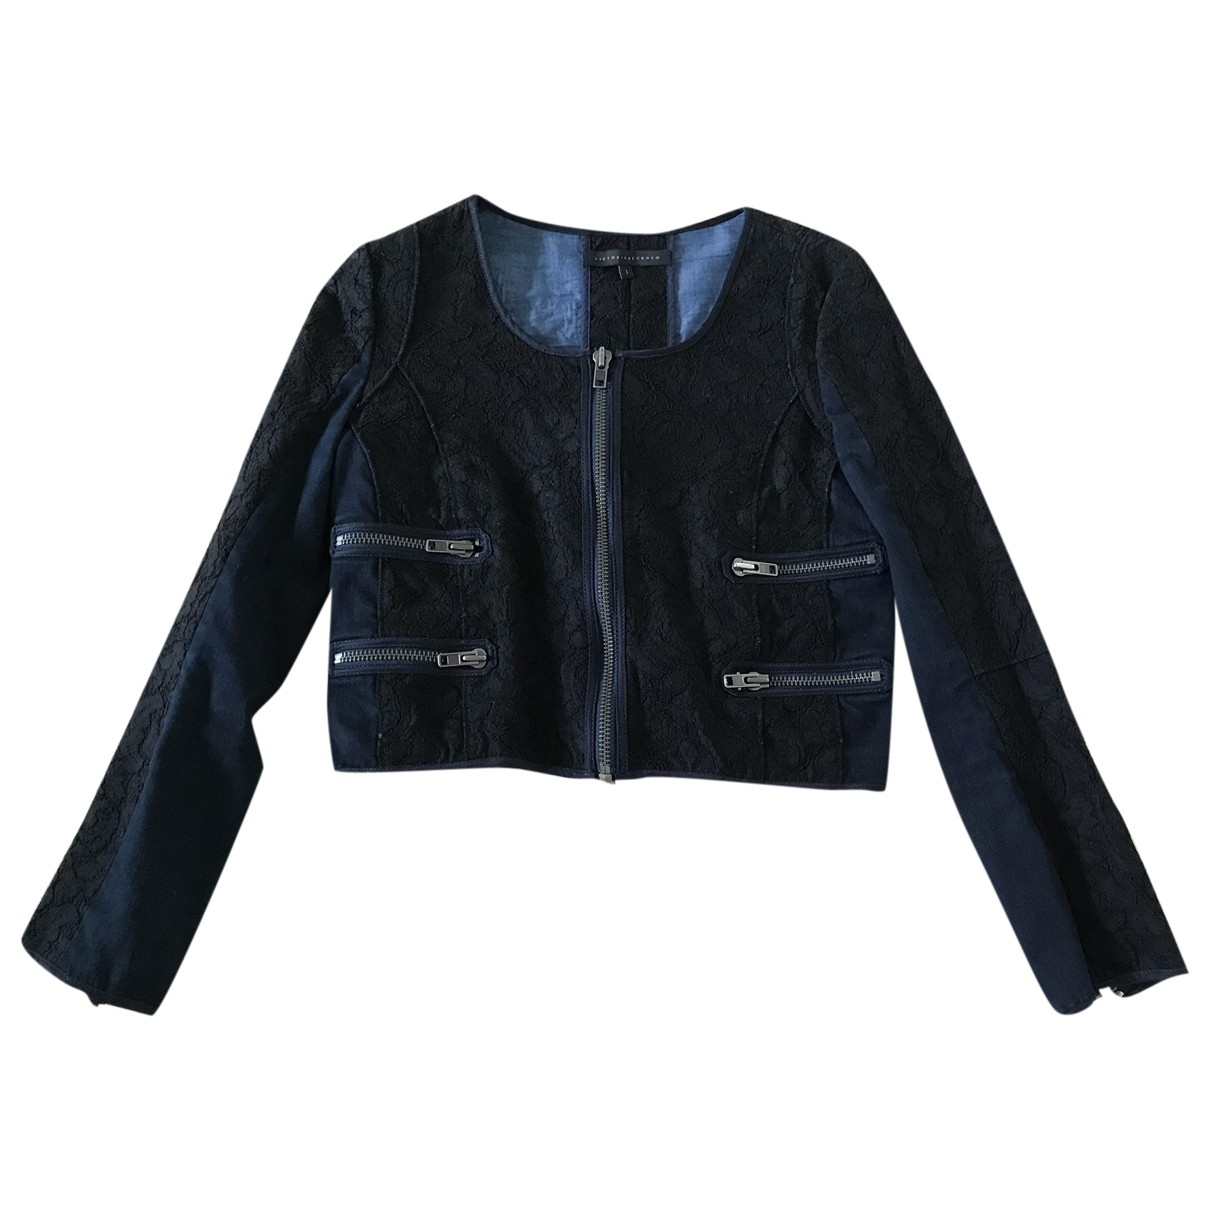 Victoria Beckham \N Jacke in  Blau Denim - Jeans